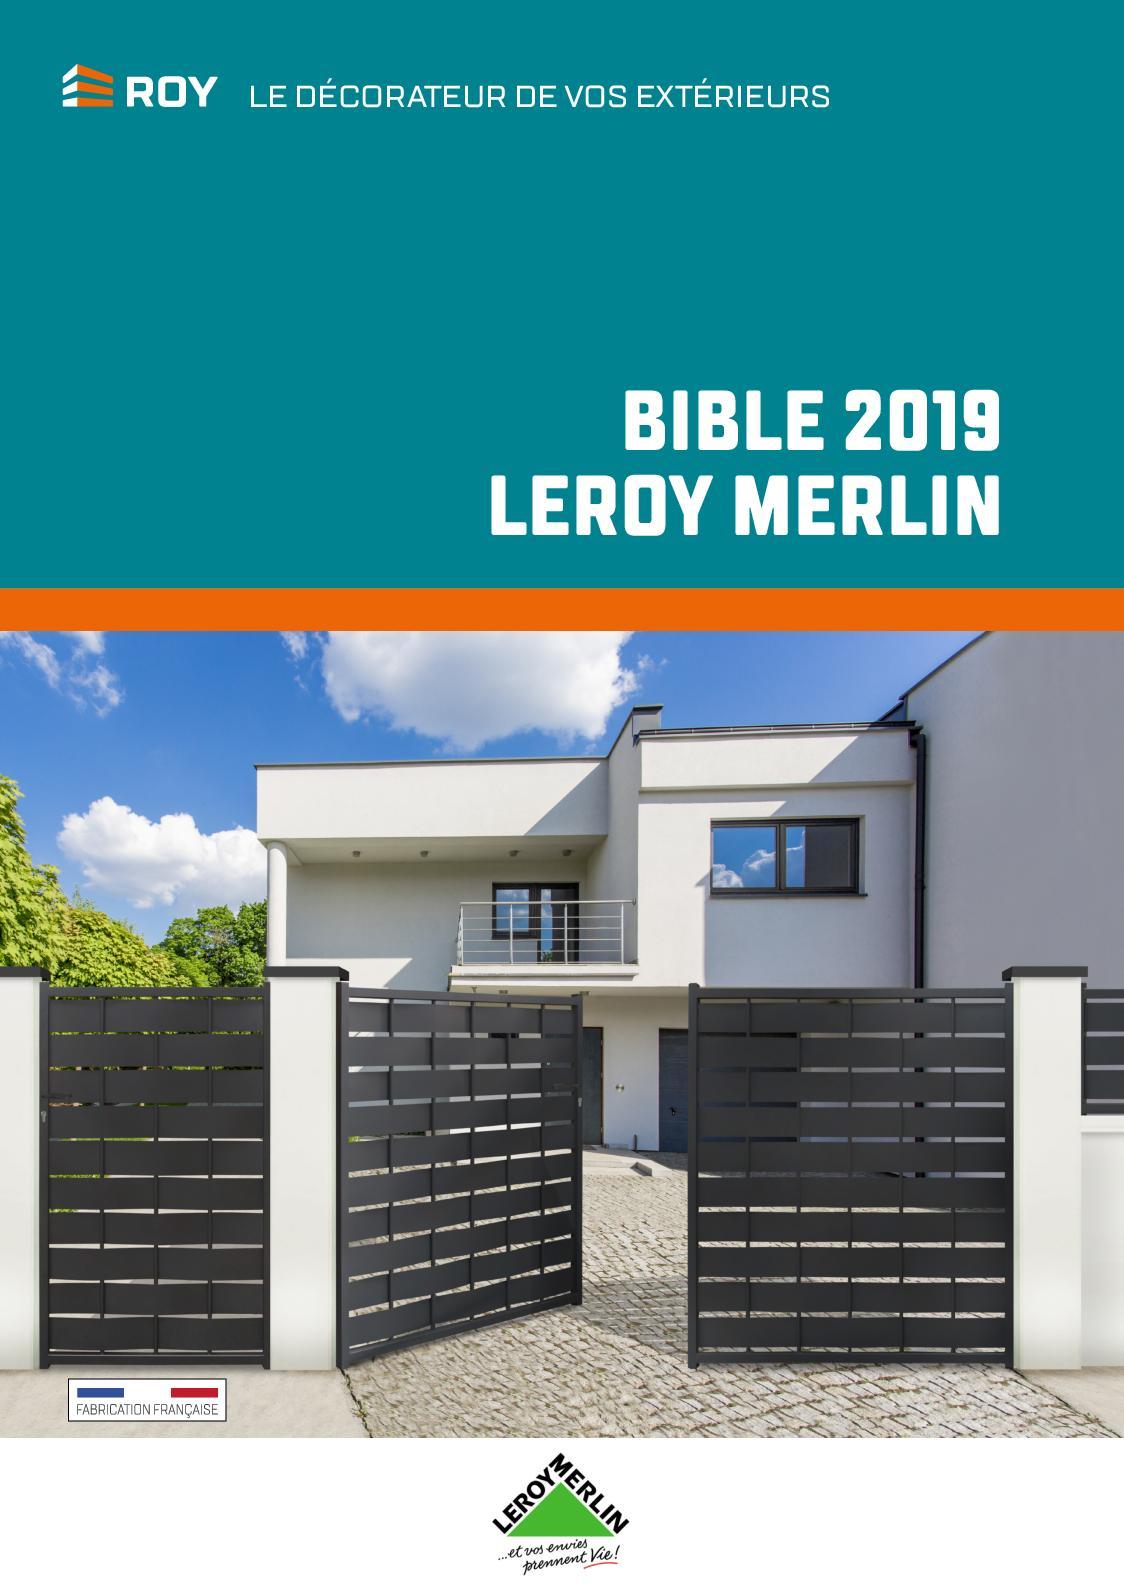 Corniere Finition Terrasse Composite Leroy Merlin Comment